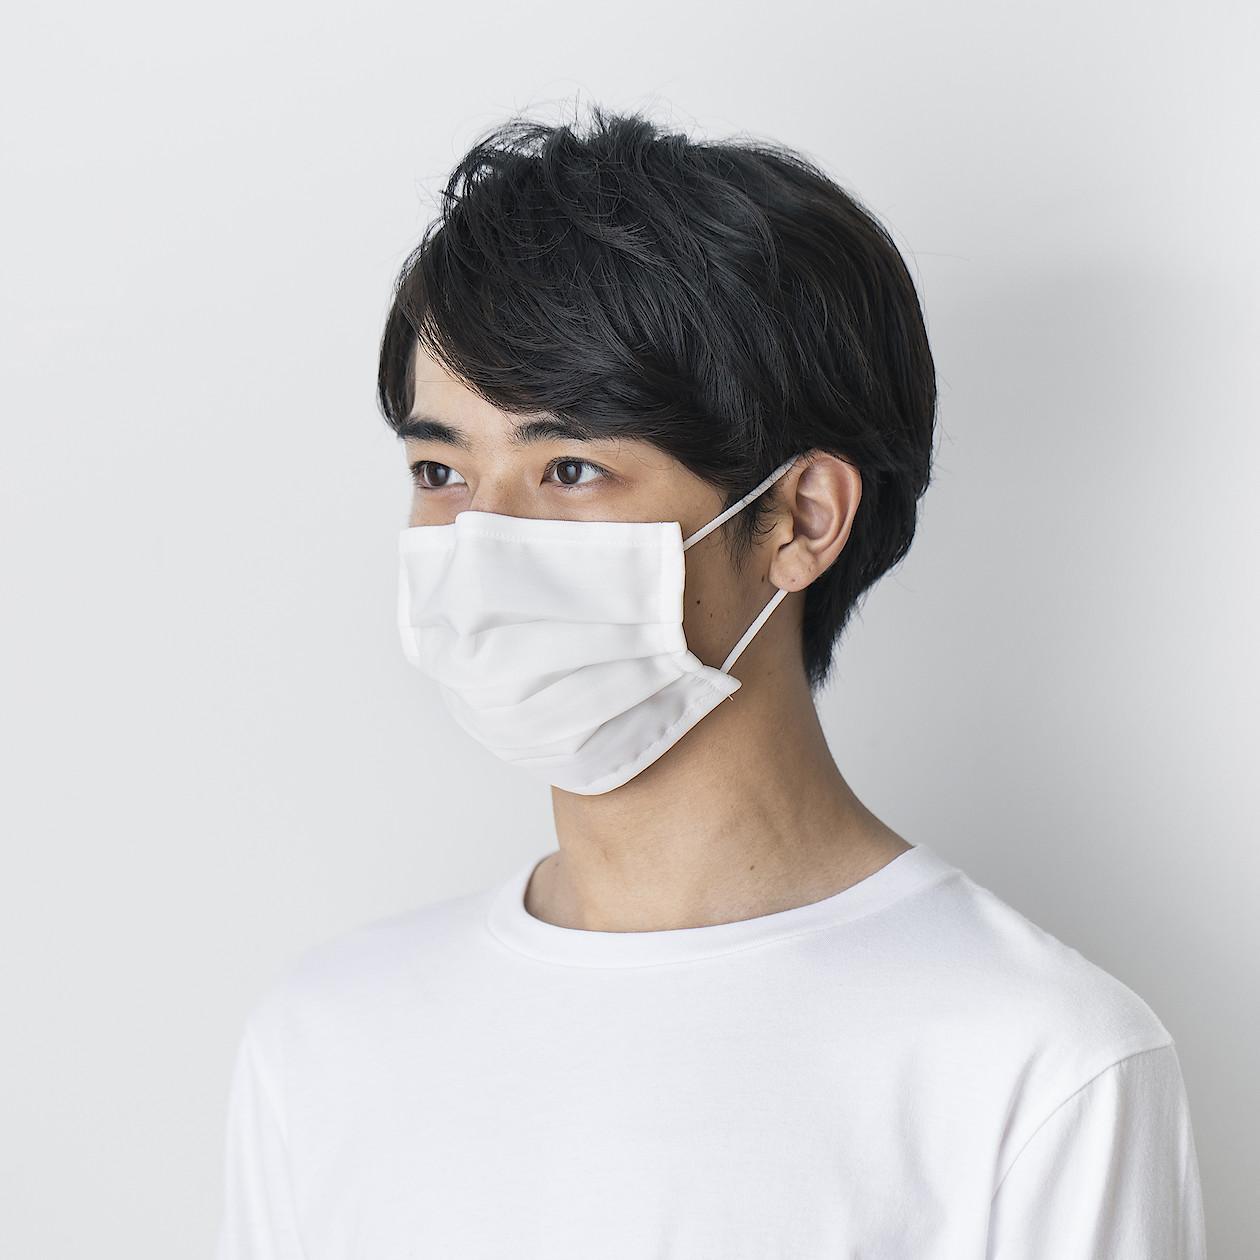 muji mask,7